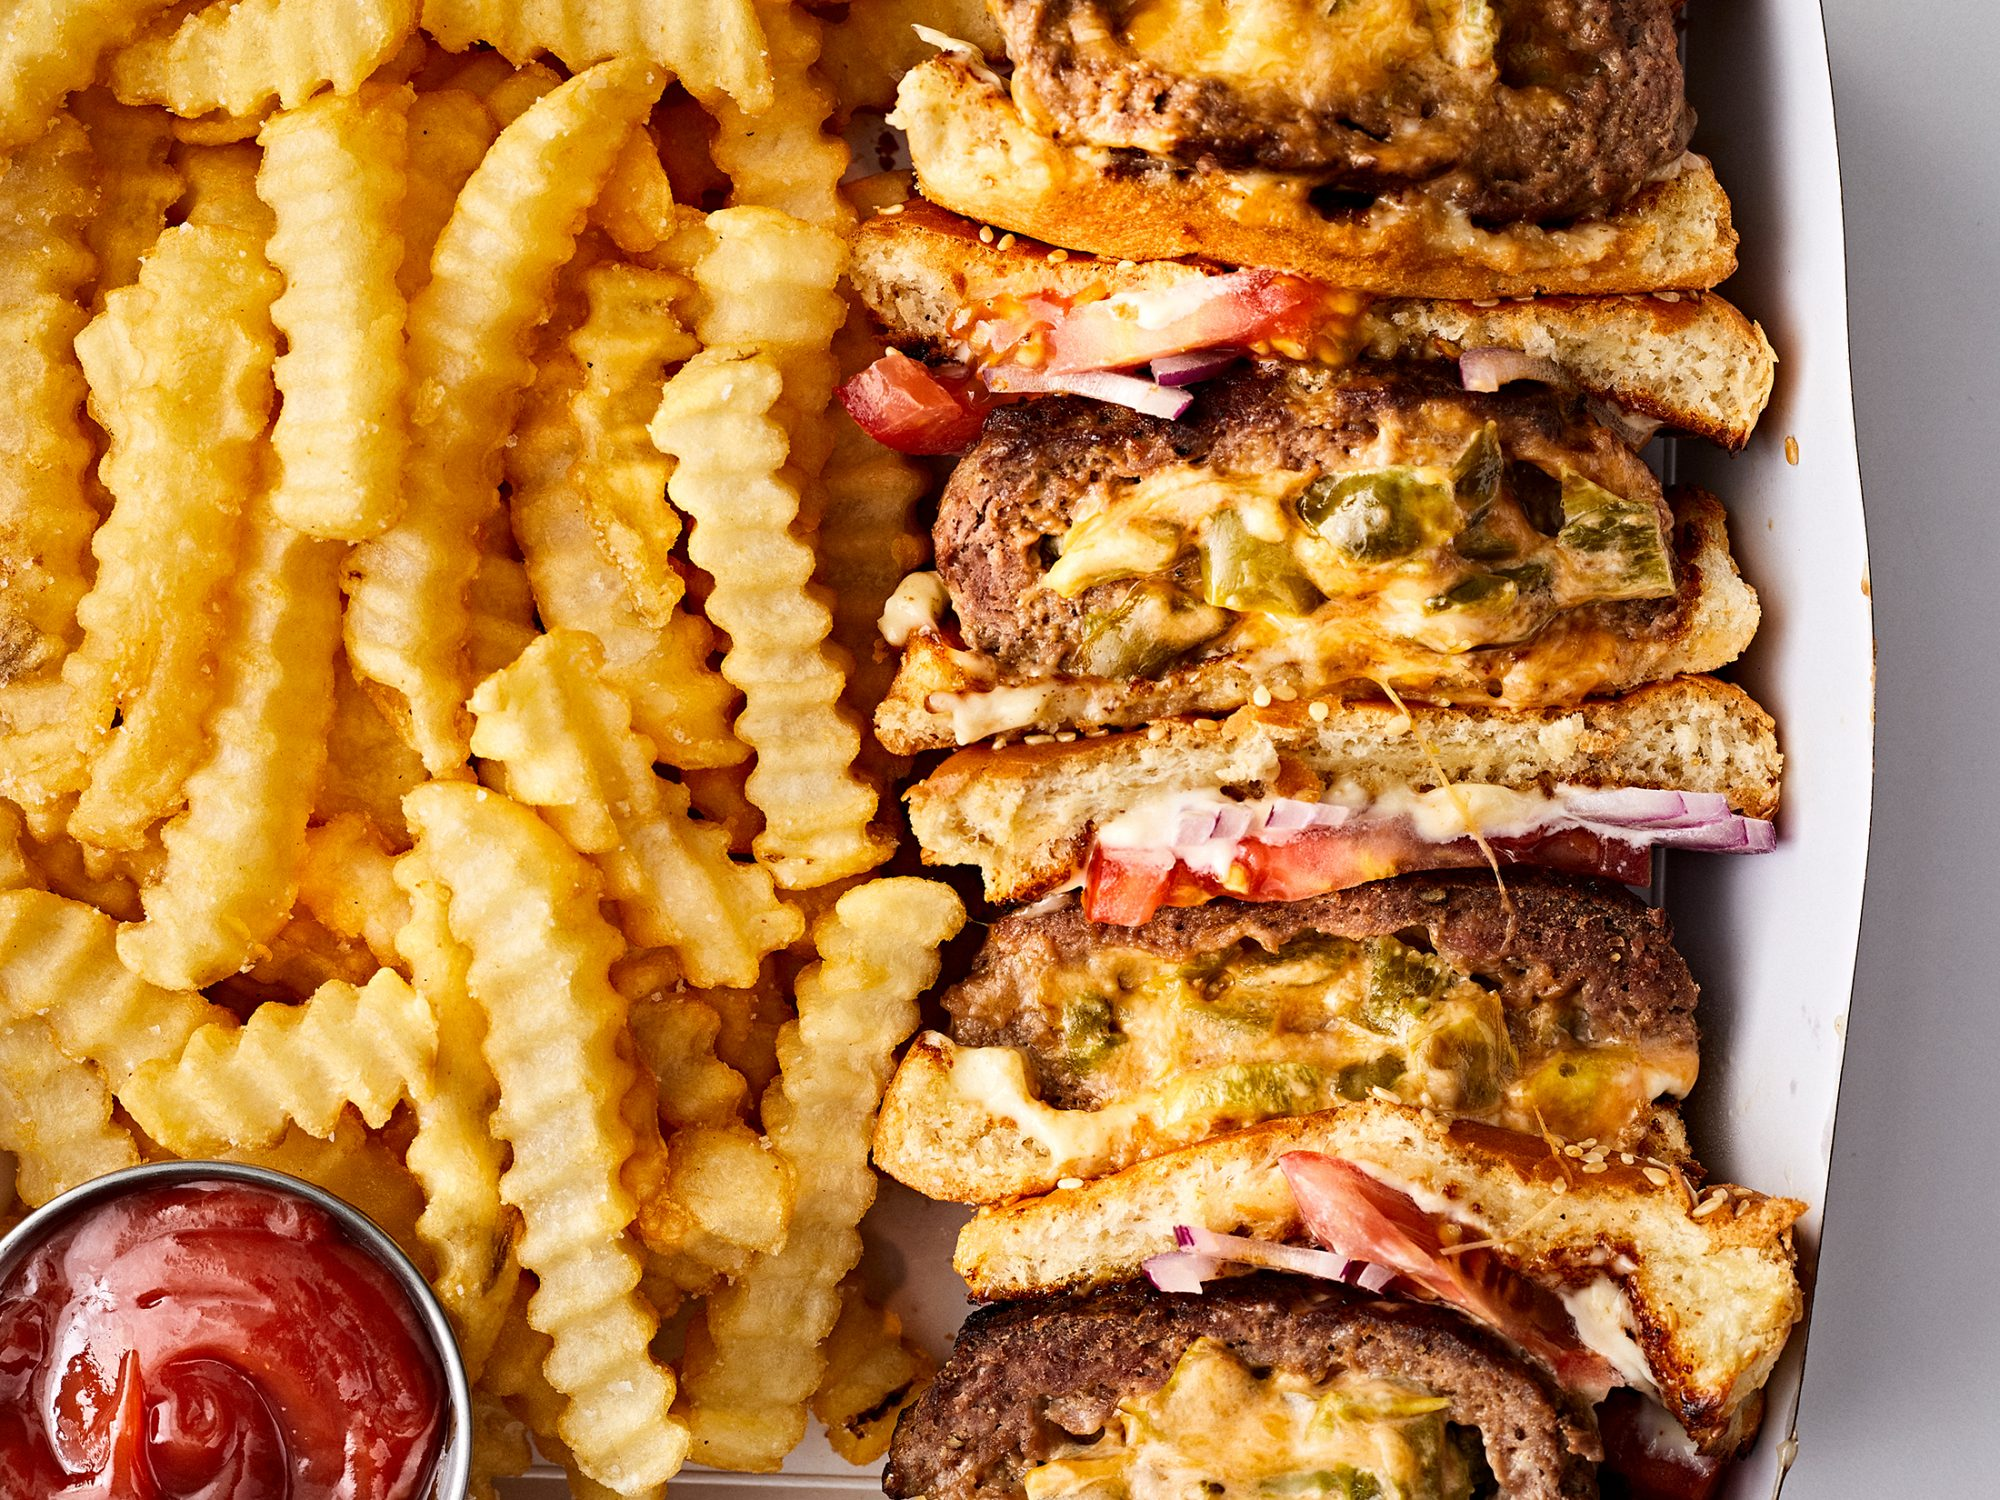 Jalapeño Popper Stuffed Burgers